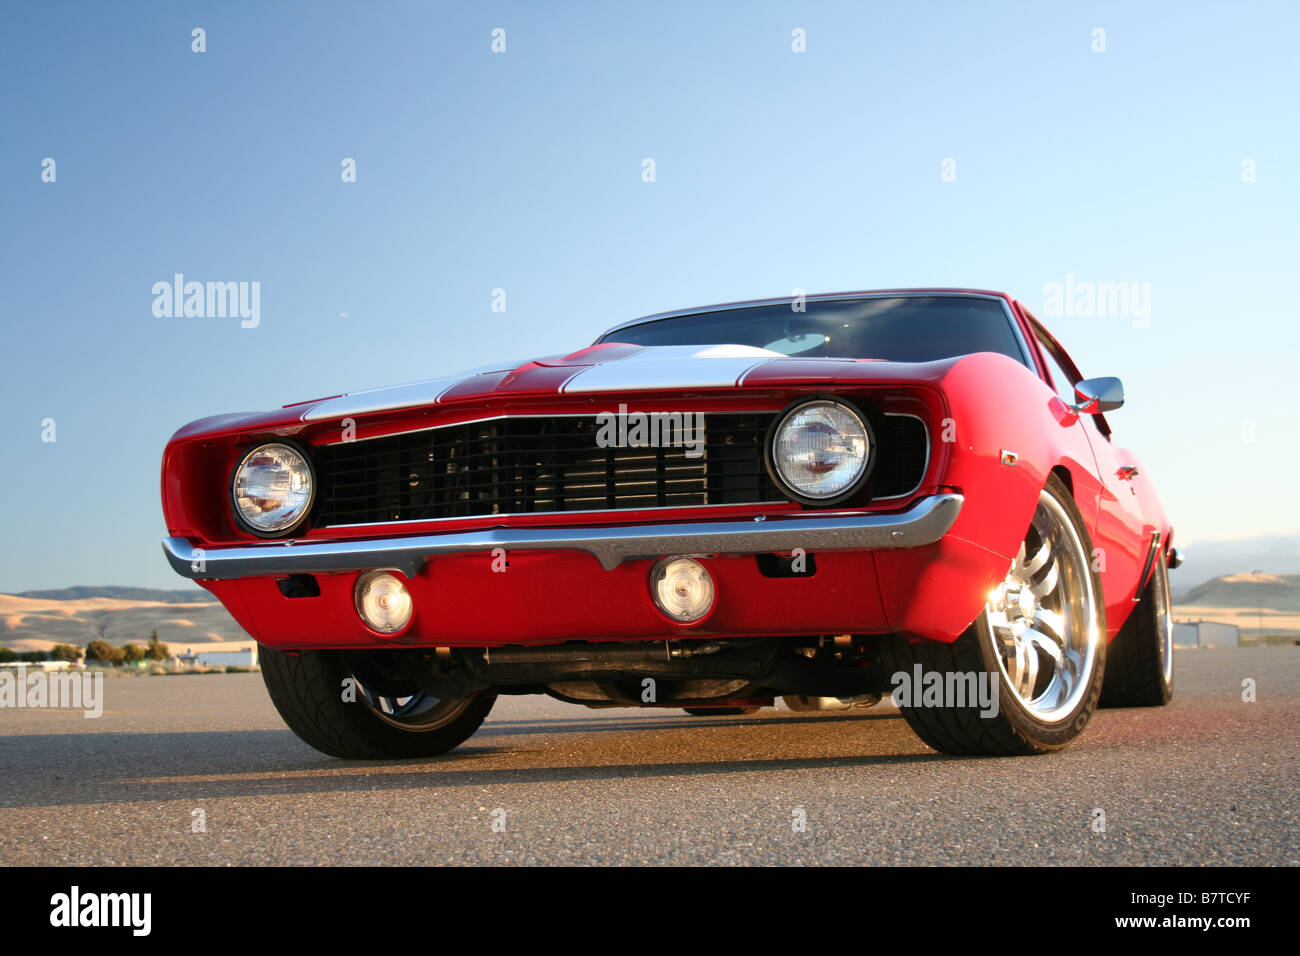 1969 Camaro Stock Photos & 1969 Camaro Stock Images - Alamy